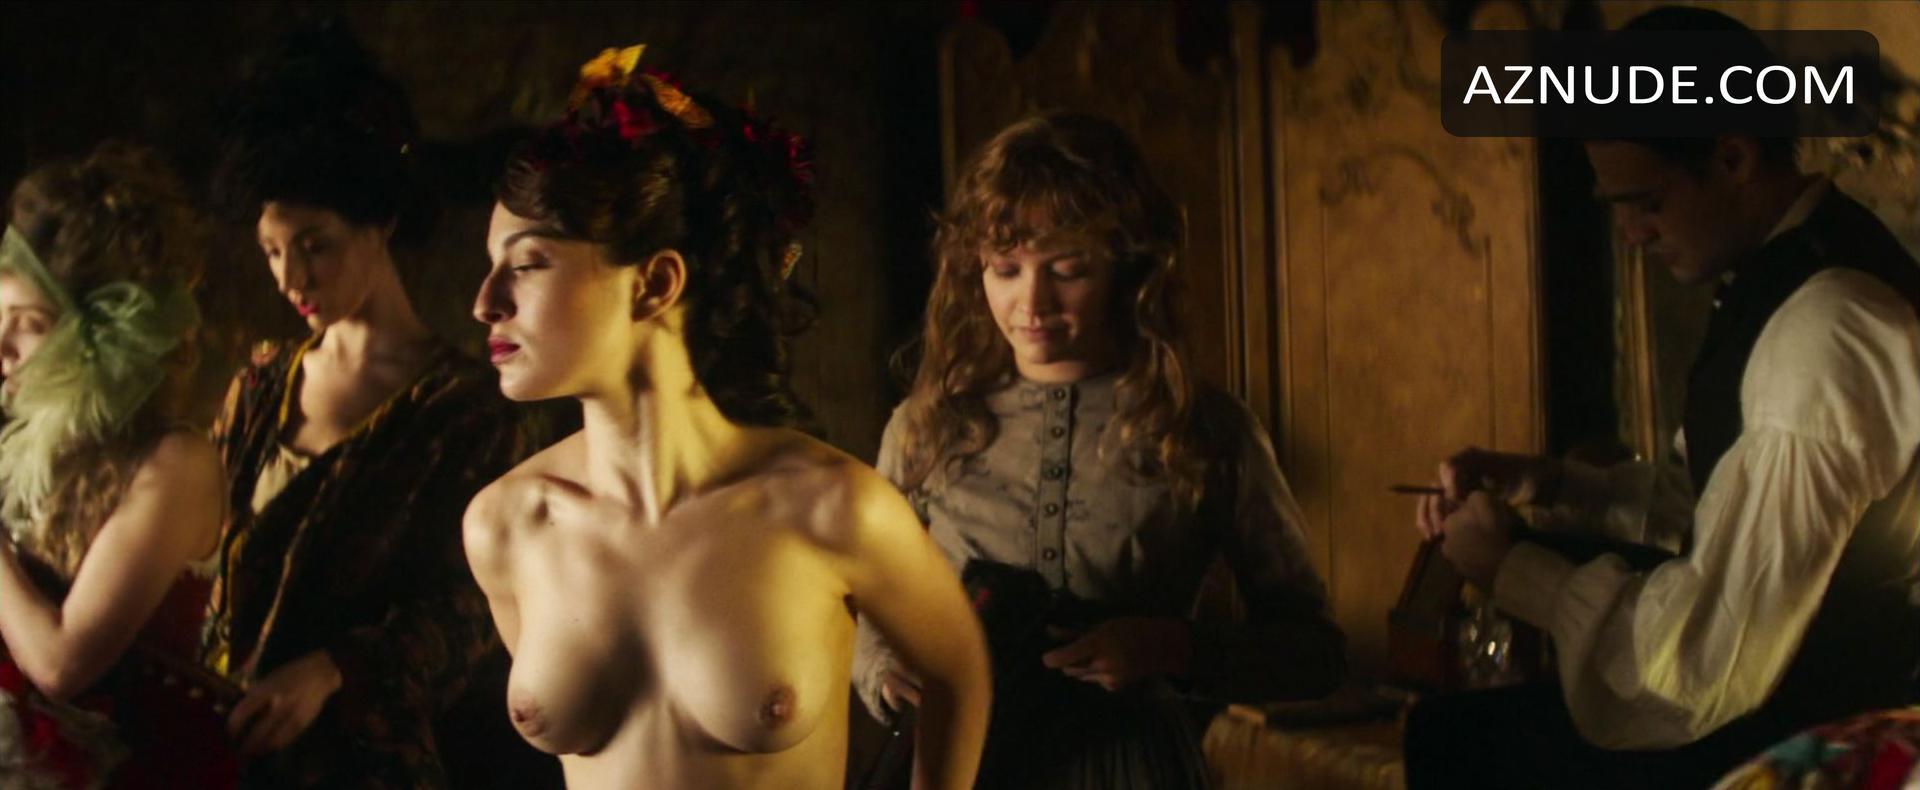 Maria Valverde Nude